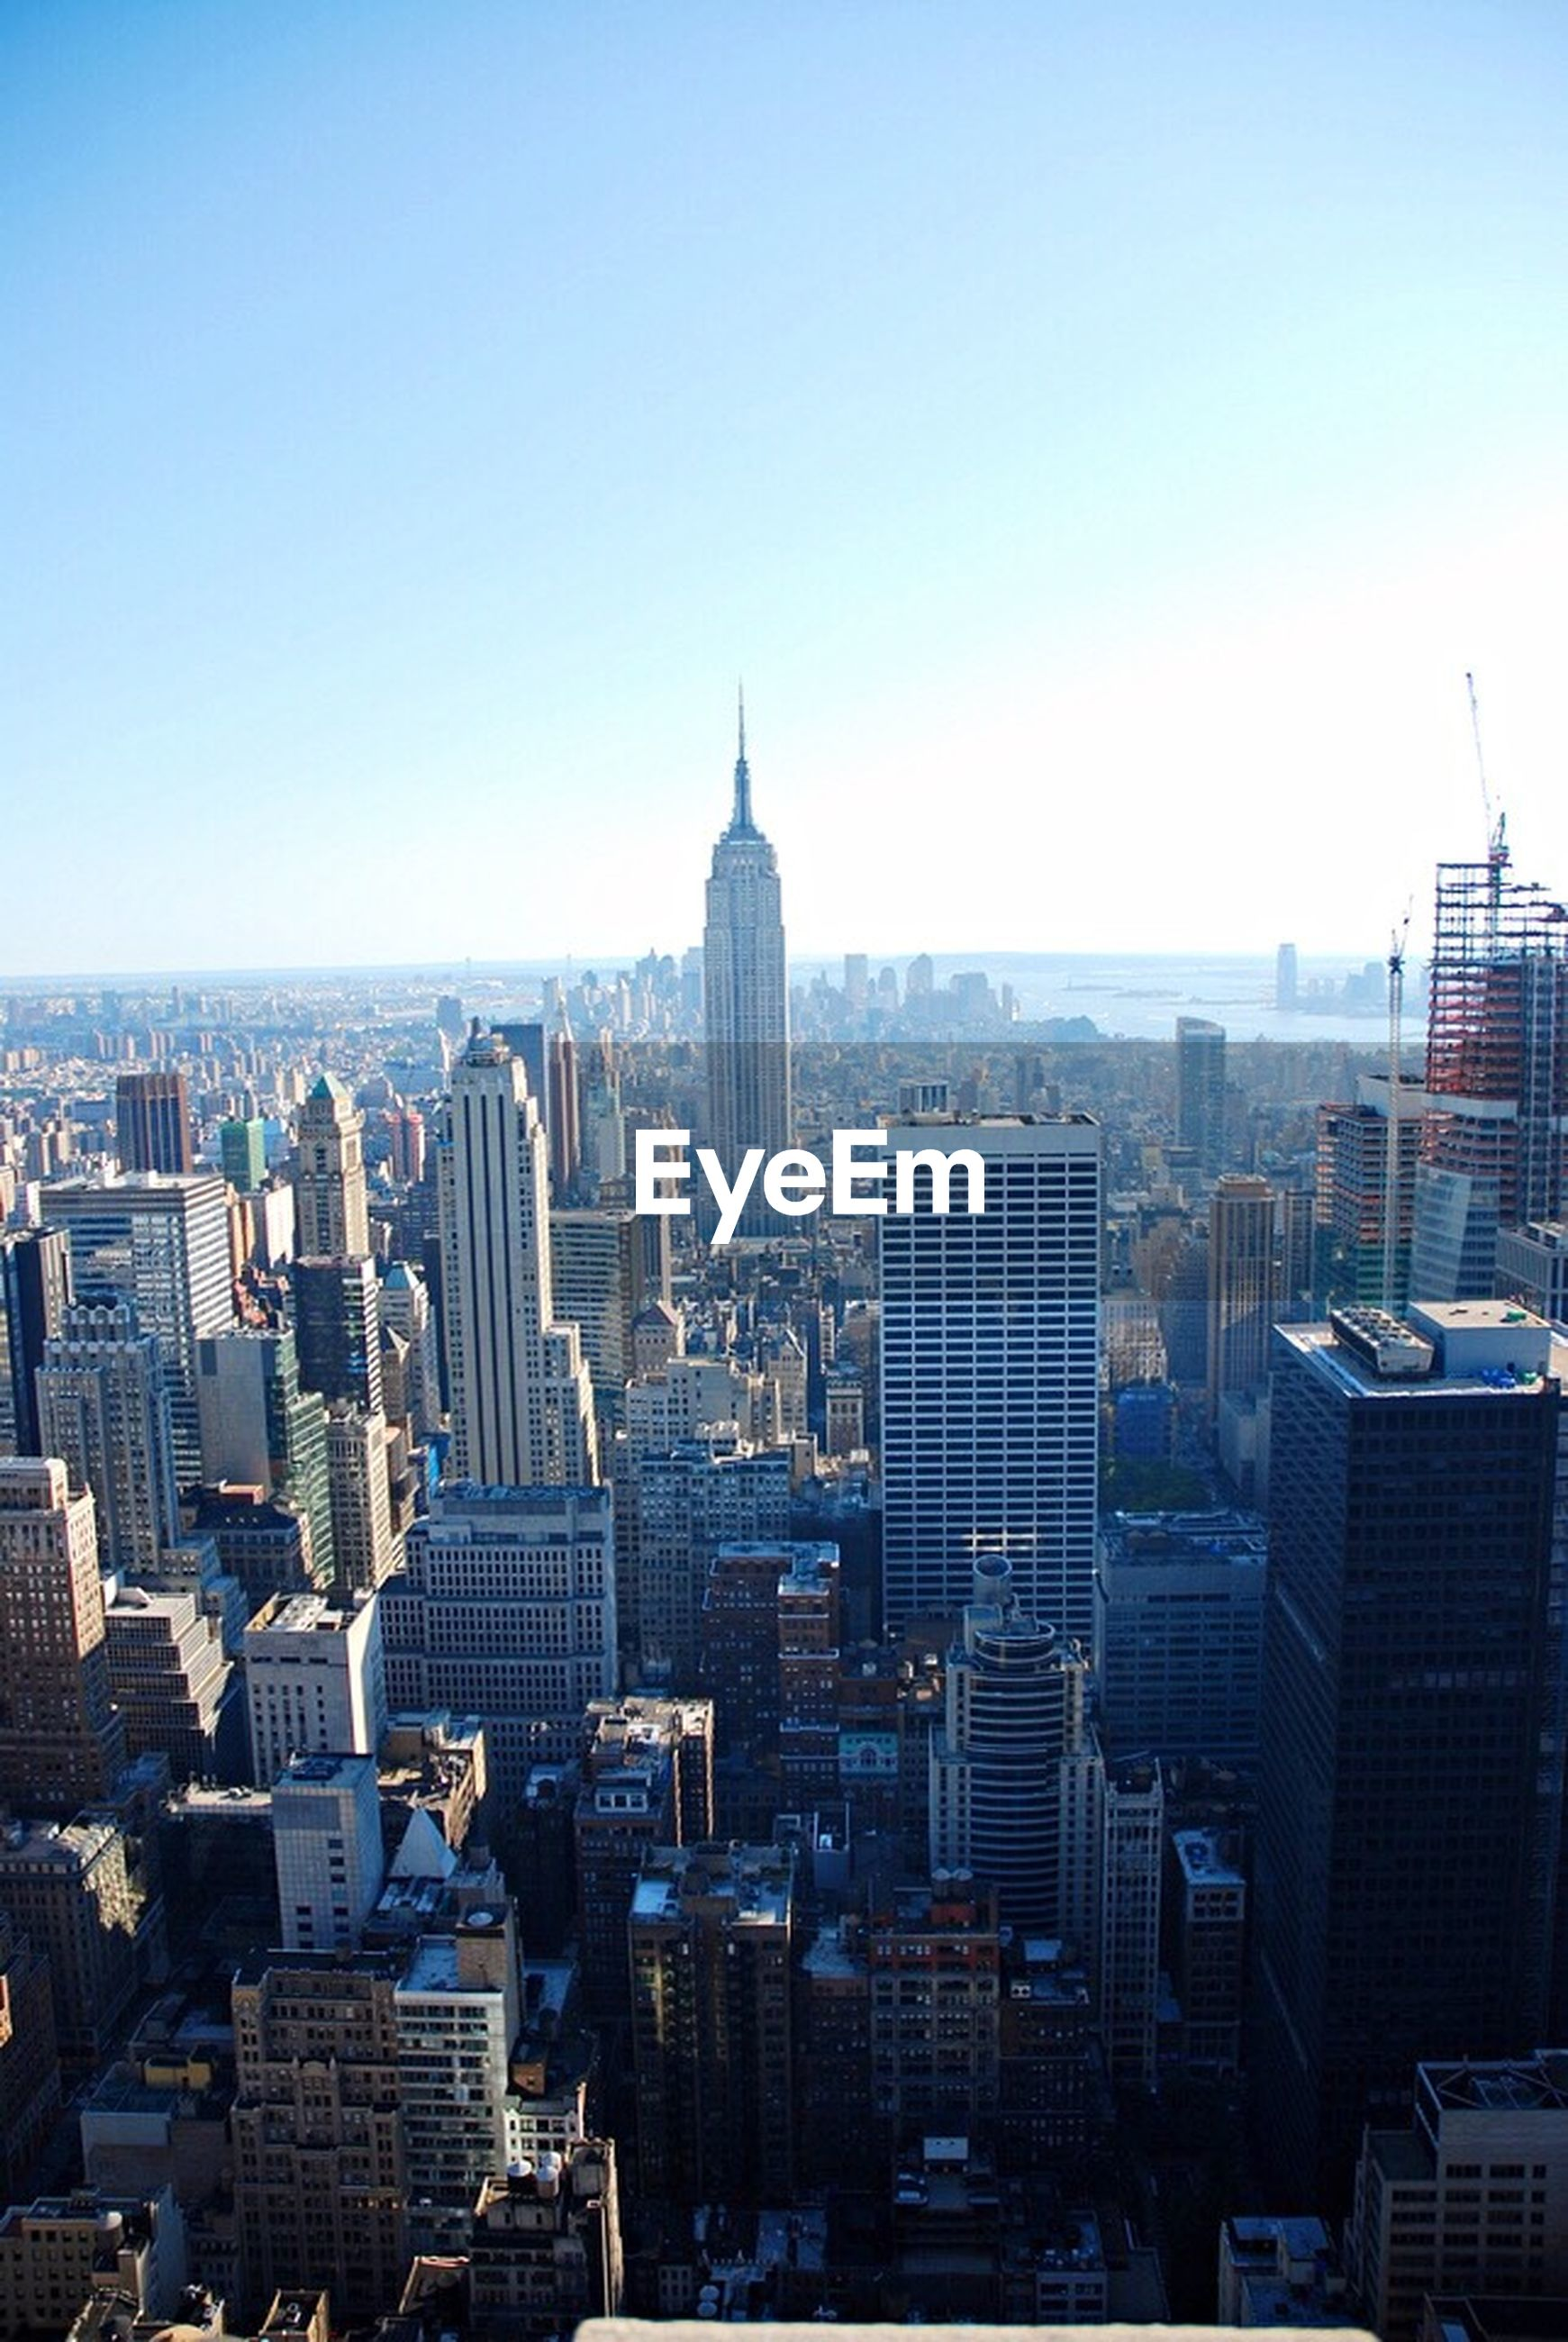 VIEW OF CITY SKYLINE